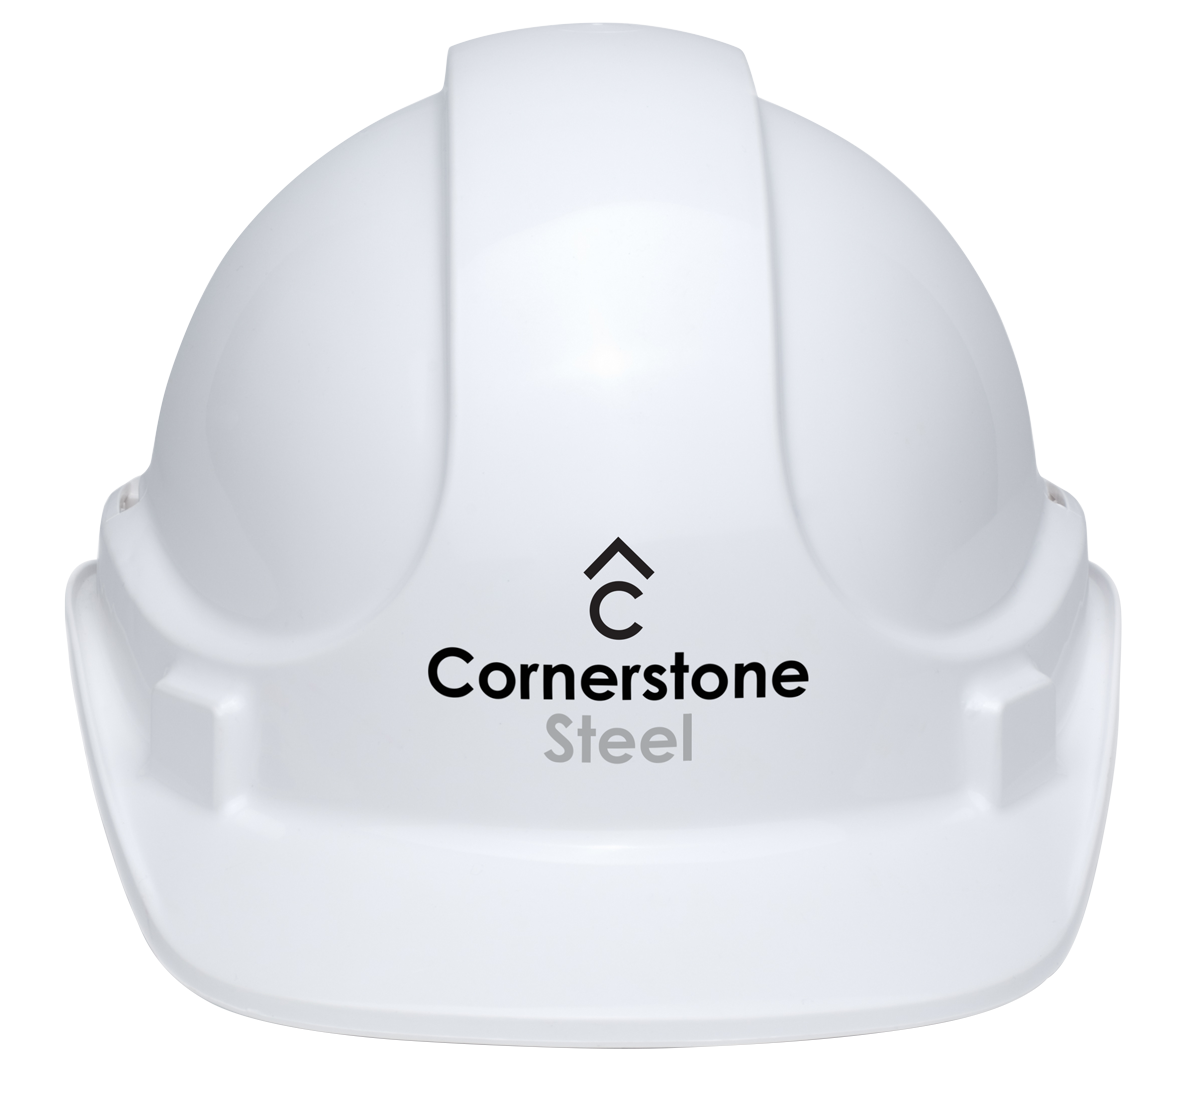 Cornerstone Steel construction hat